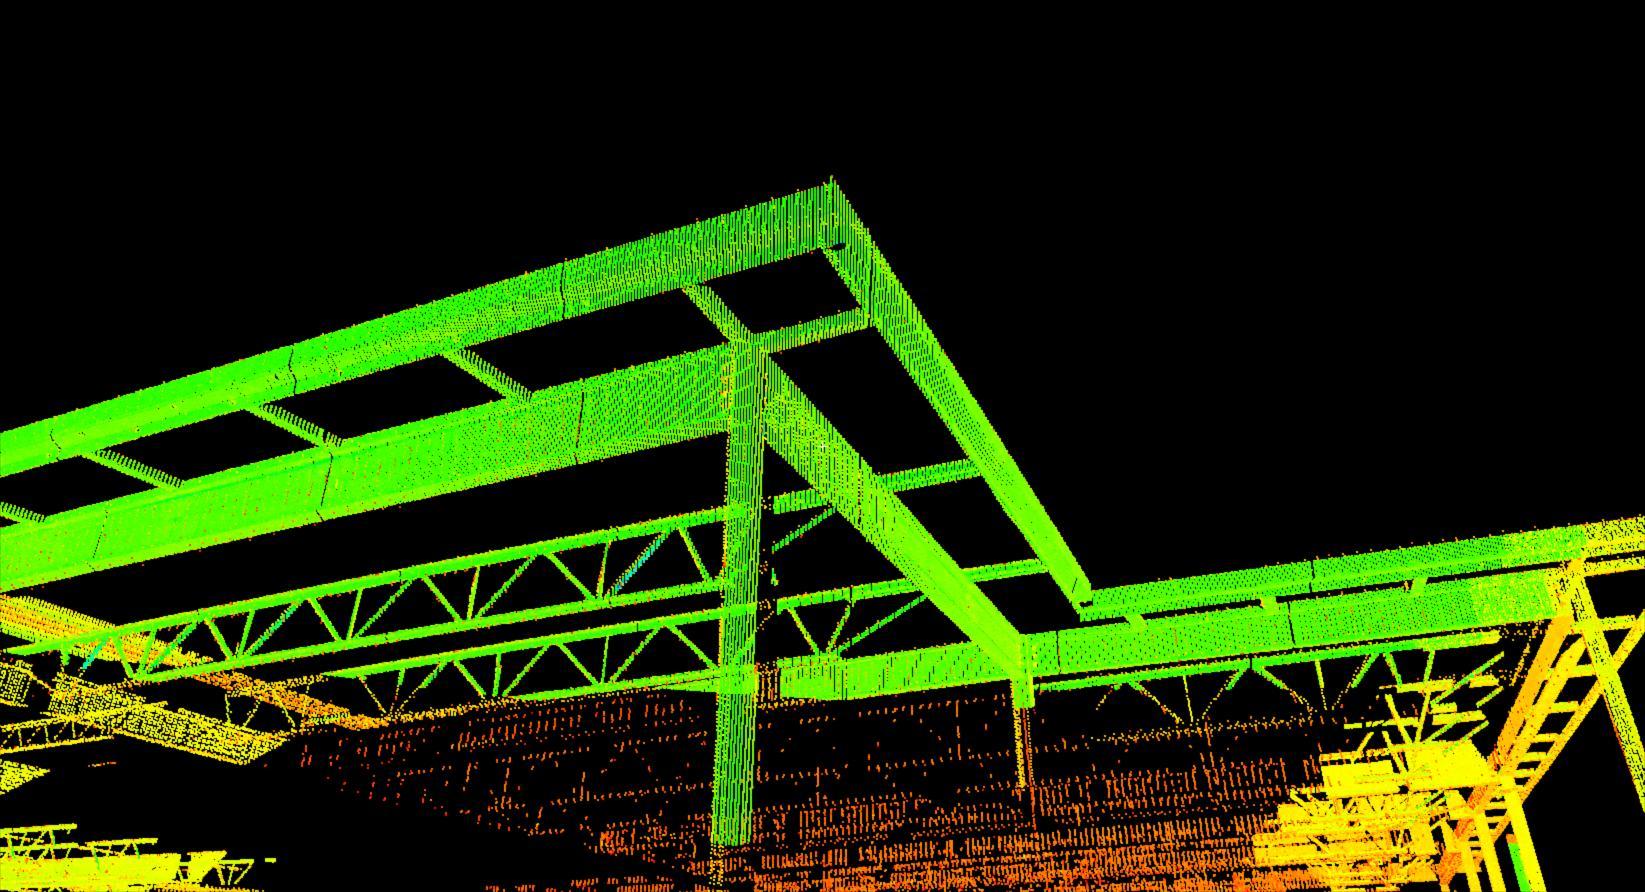 Steel As-built - Woonsocket, RI (2008) - A.S. Elliott & Associates